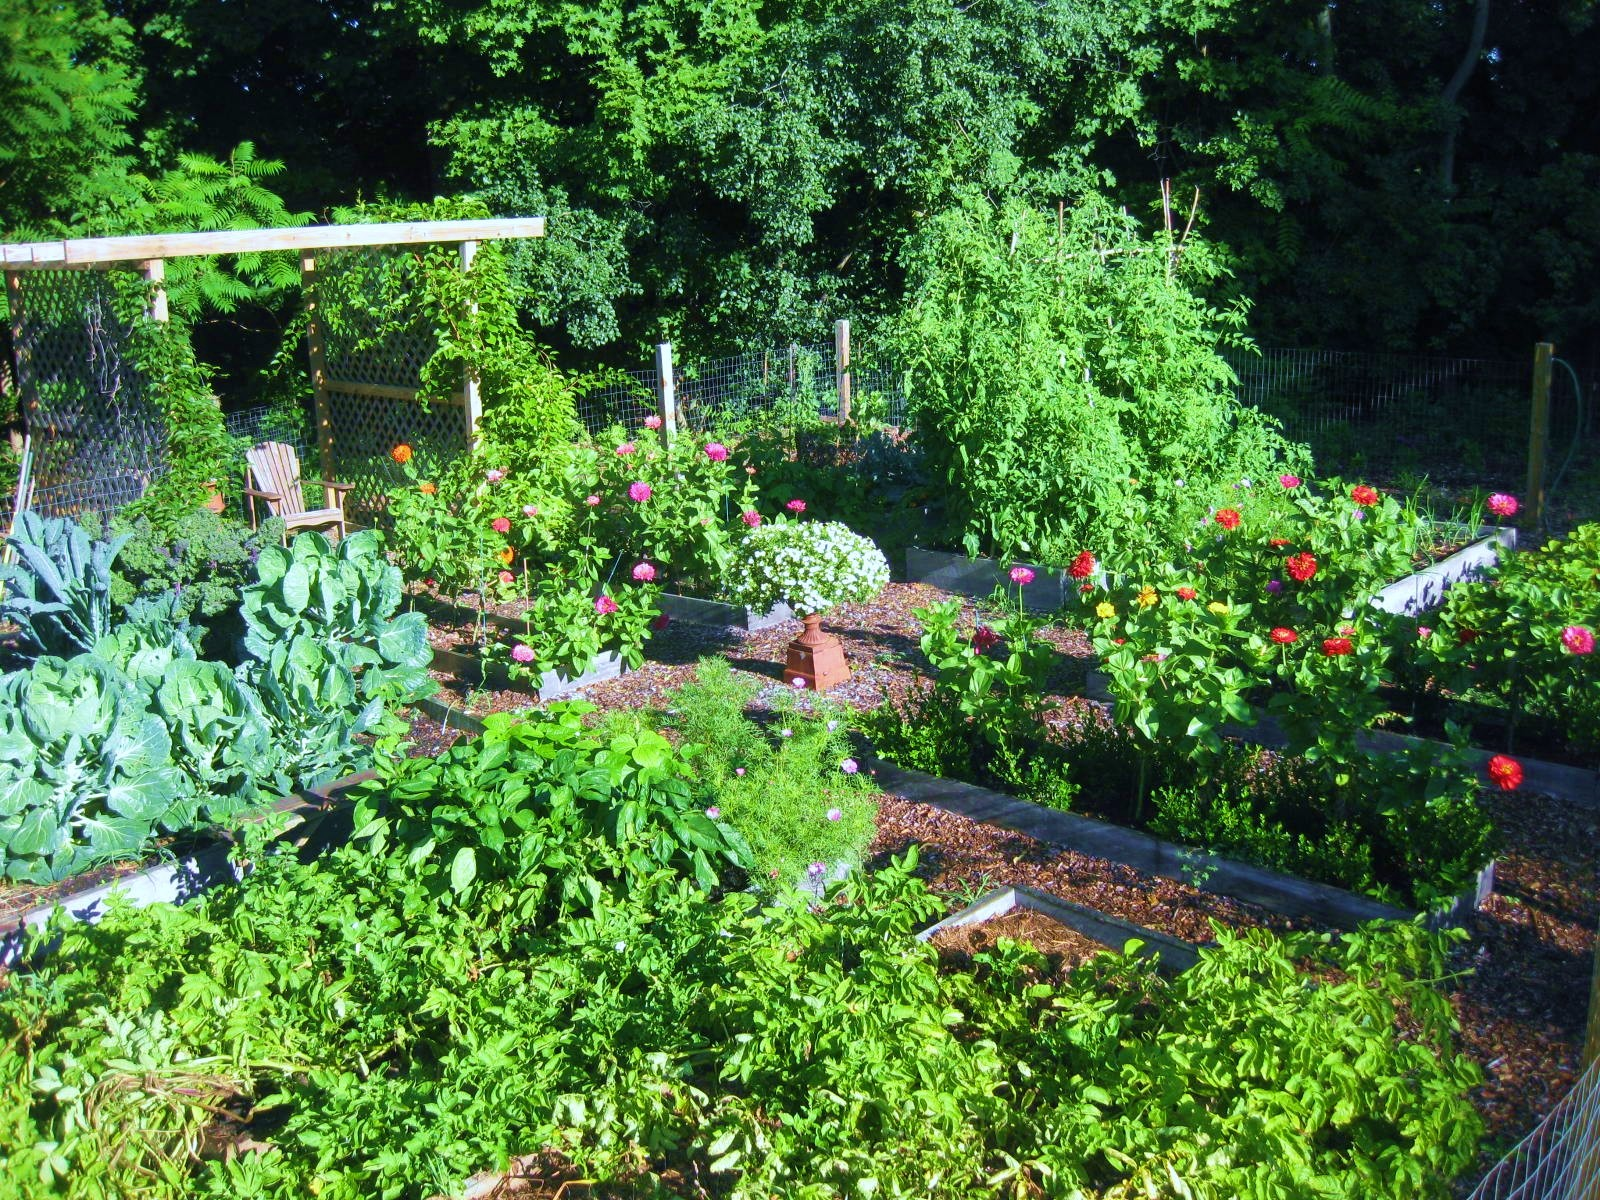 Your Veggie Garden, in Hindsight